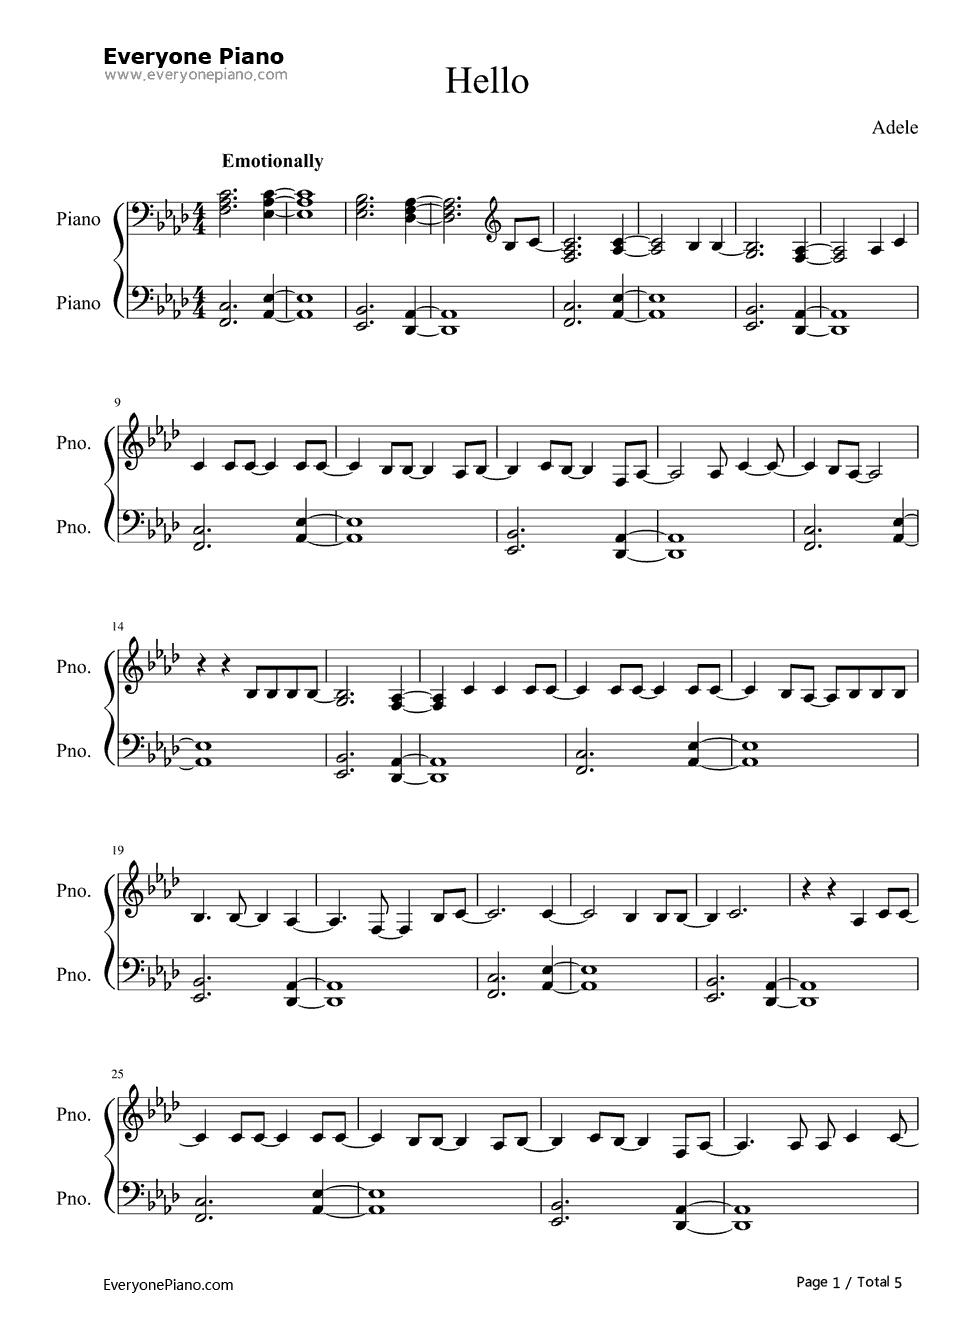 Hello-Piano Version-Adele Stave Preview 1